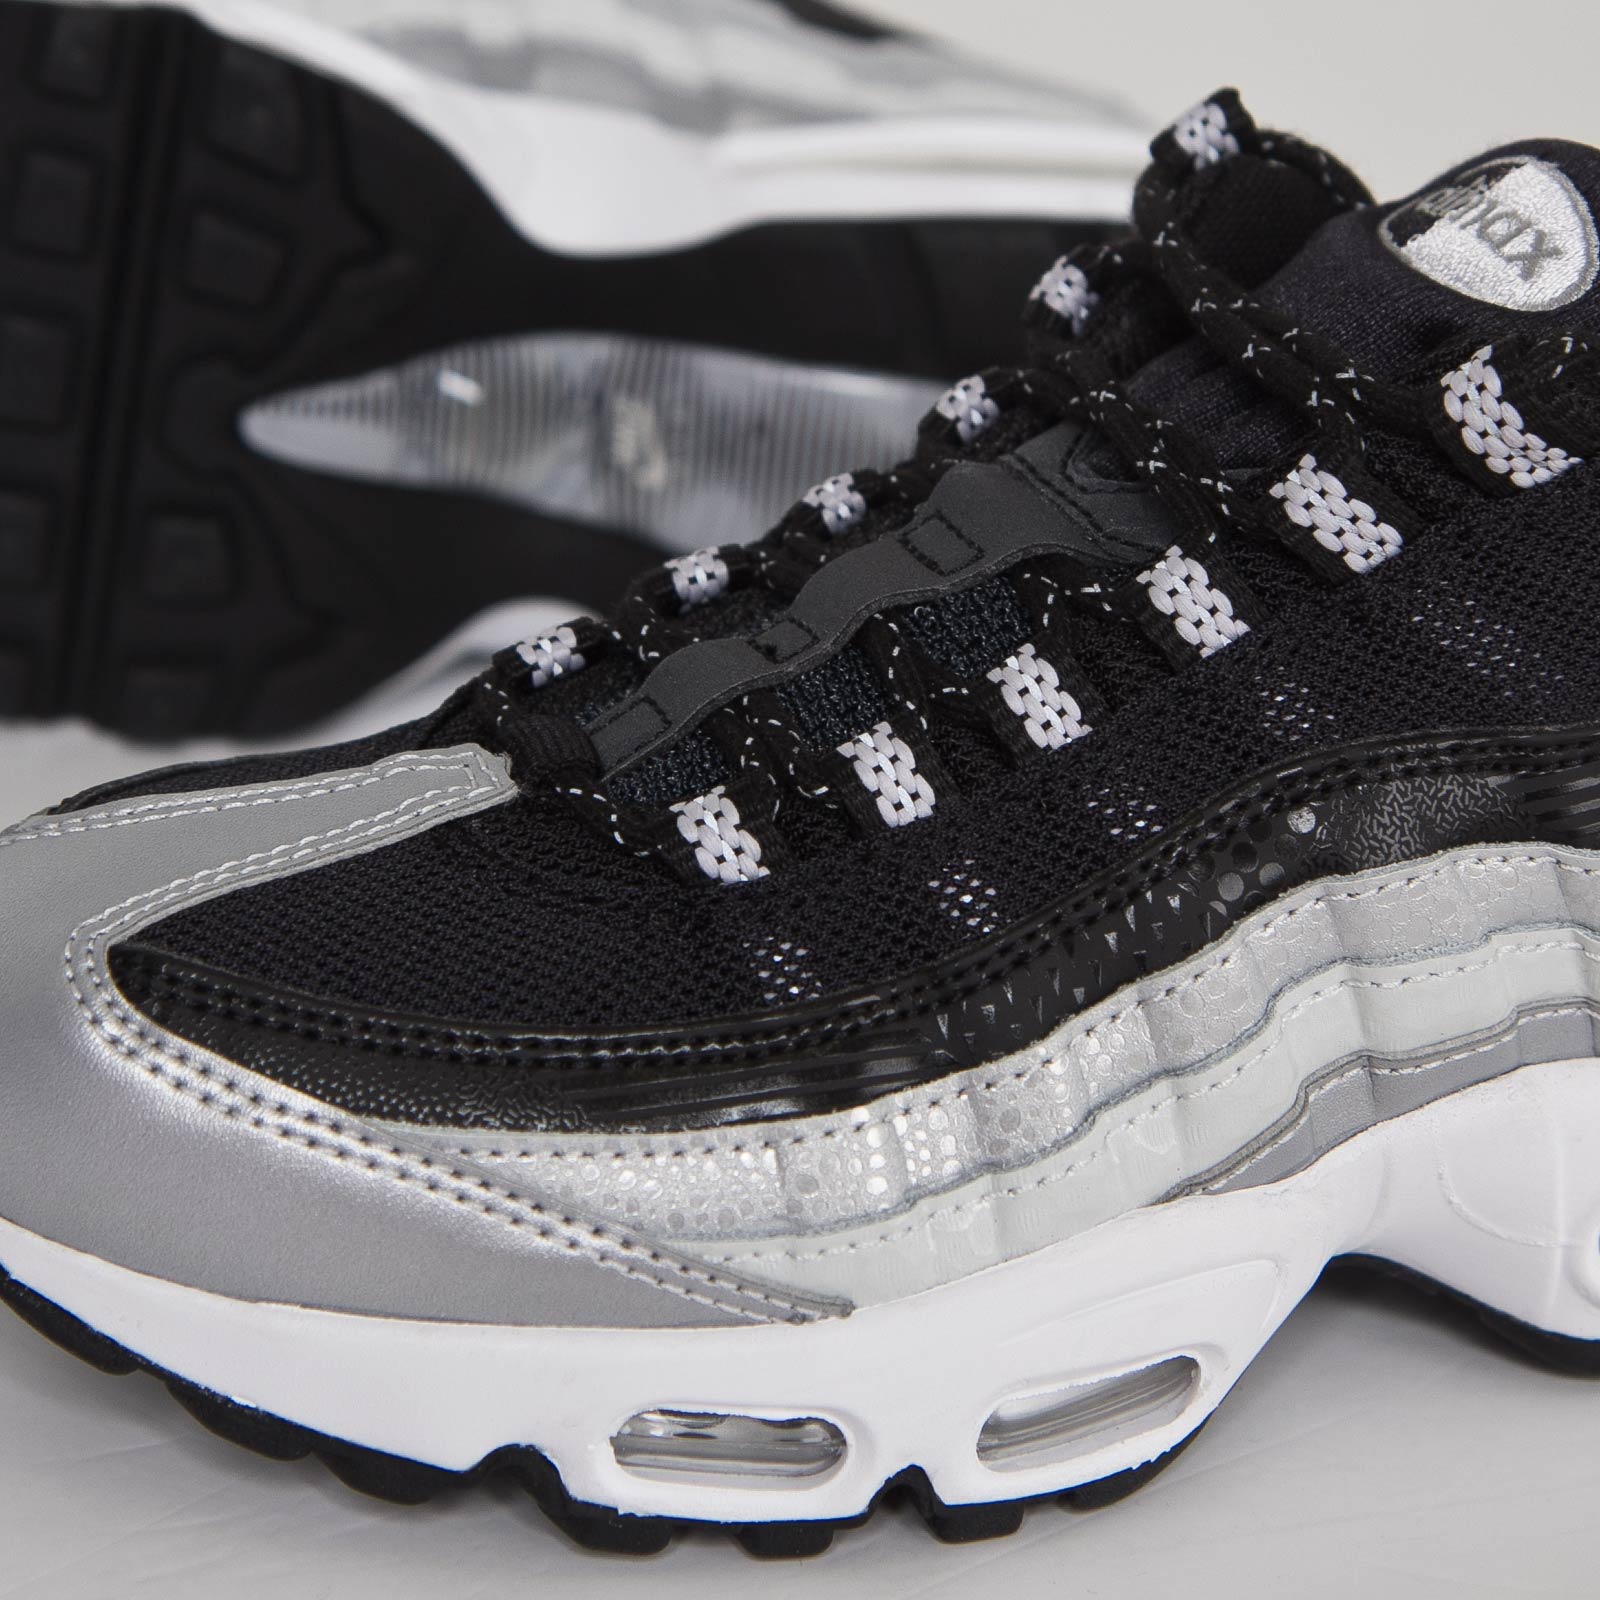 new styles 43167 23ce9 Nike Wmns Air Max 95 QS - 814914-001 - Sneakersnstuff   sneakers    streetwear online since 1999